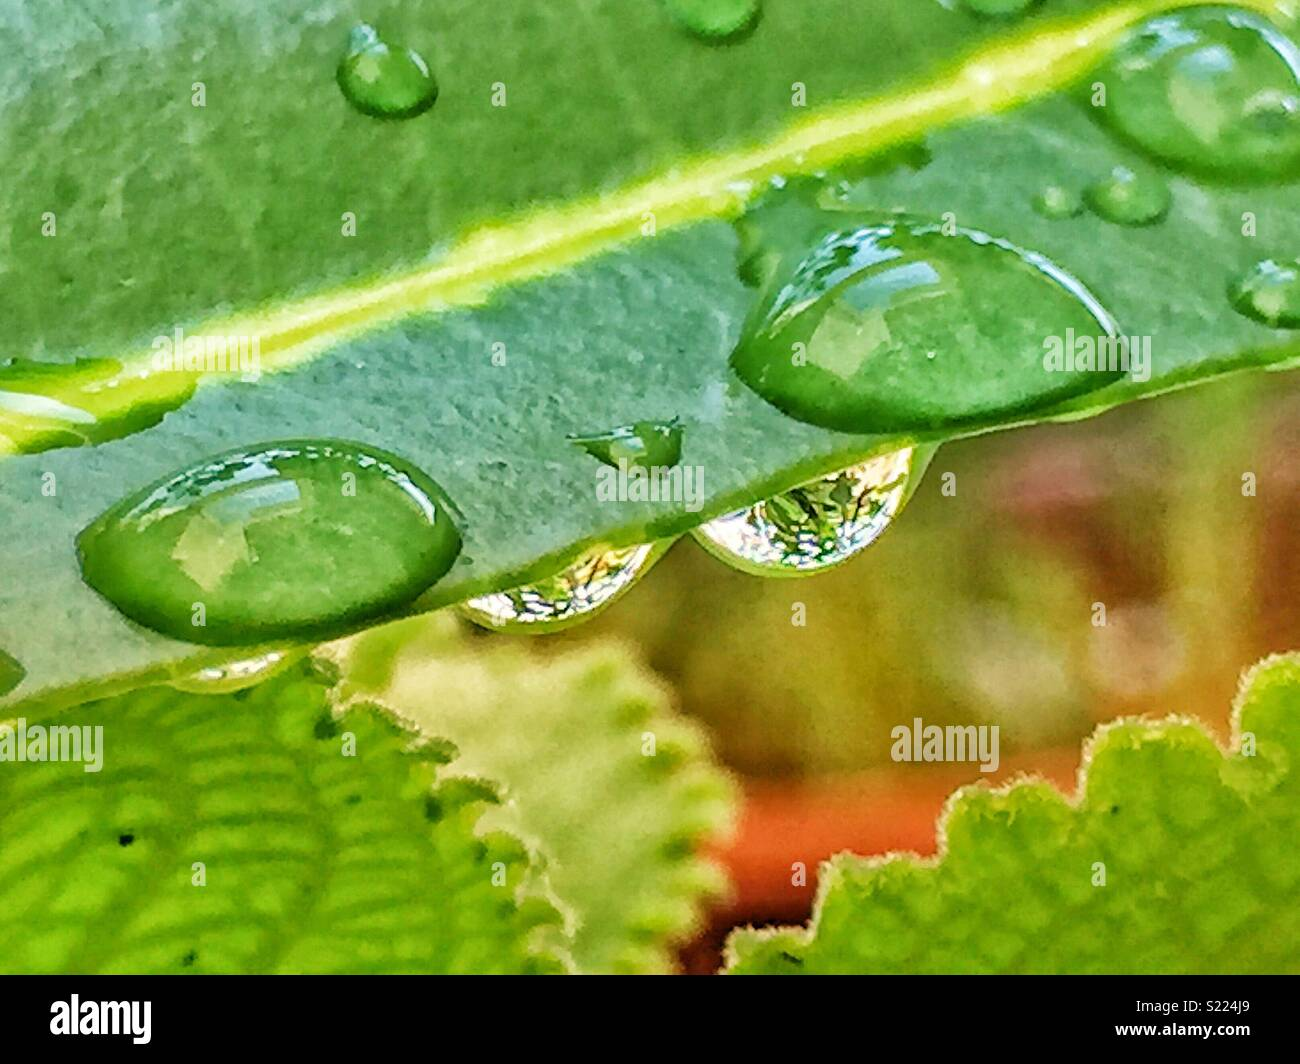 Waterdrop on leaf - Stock Image